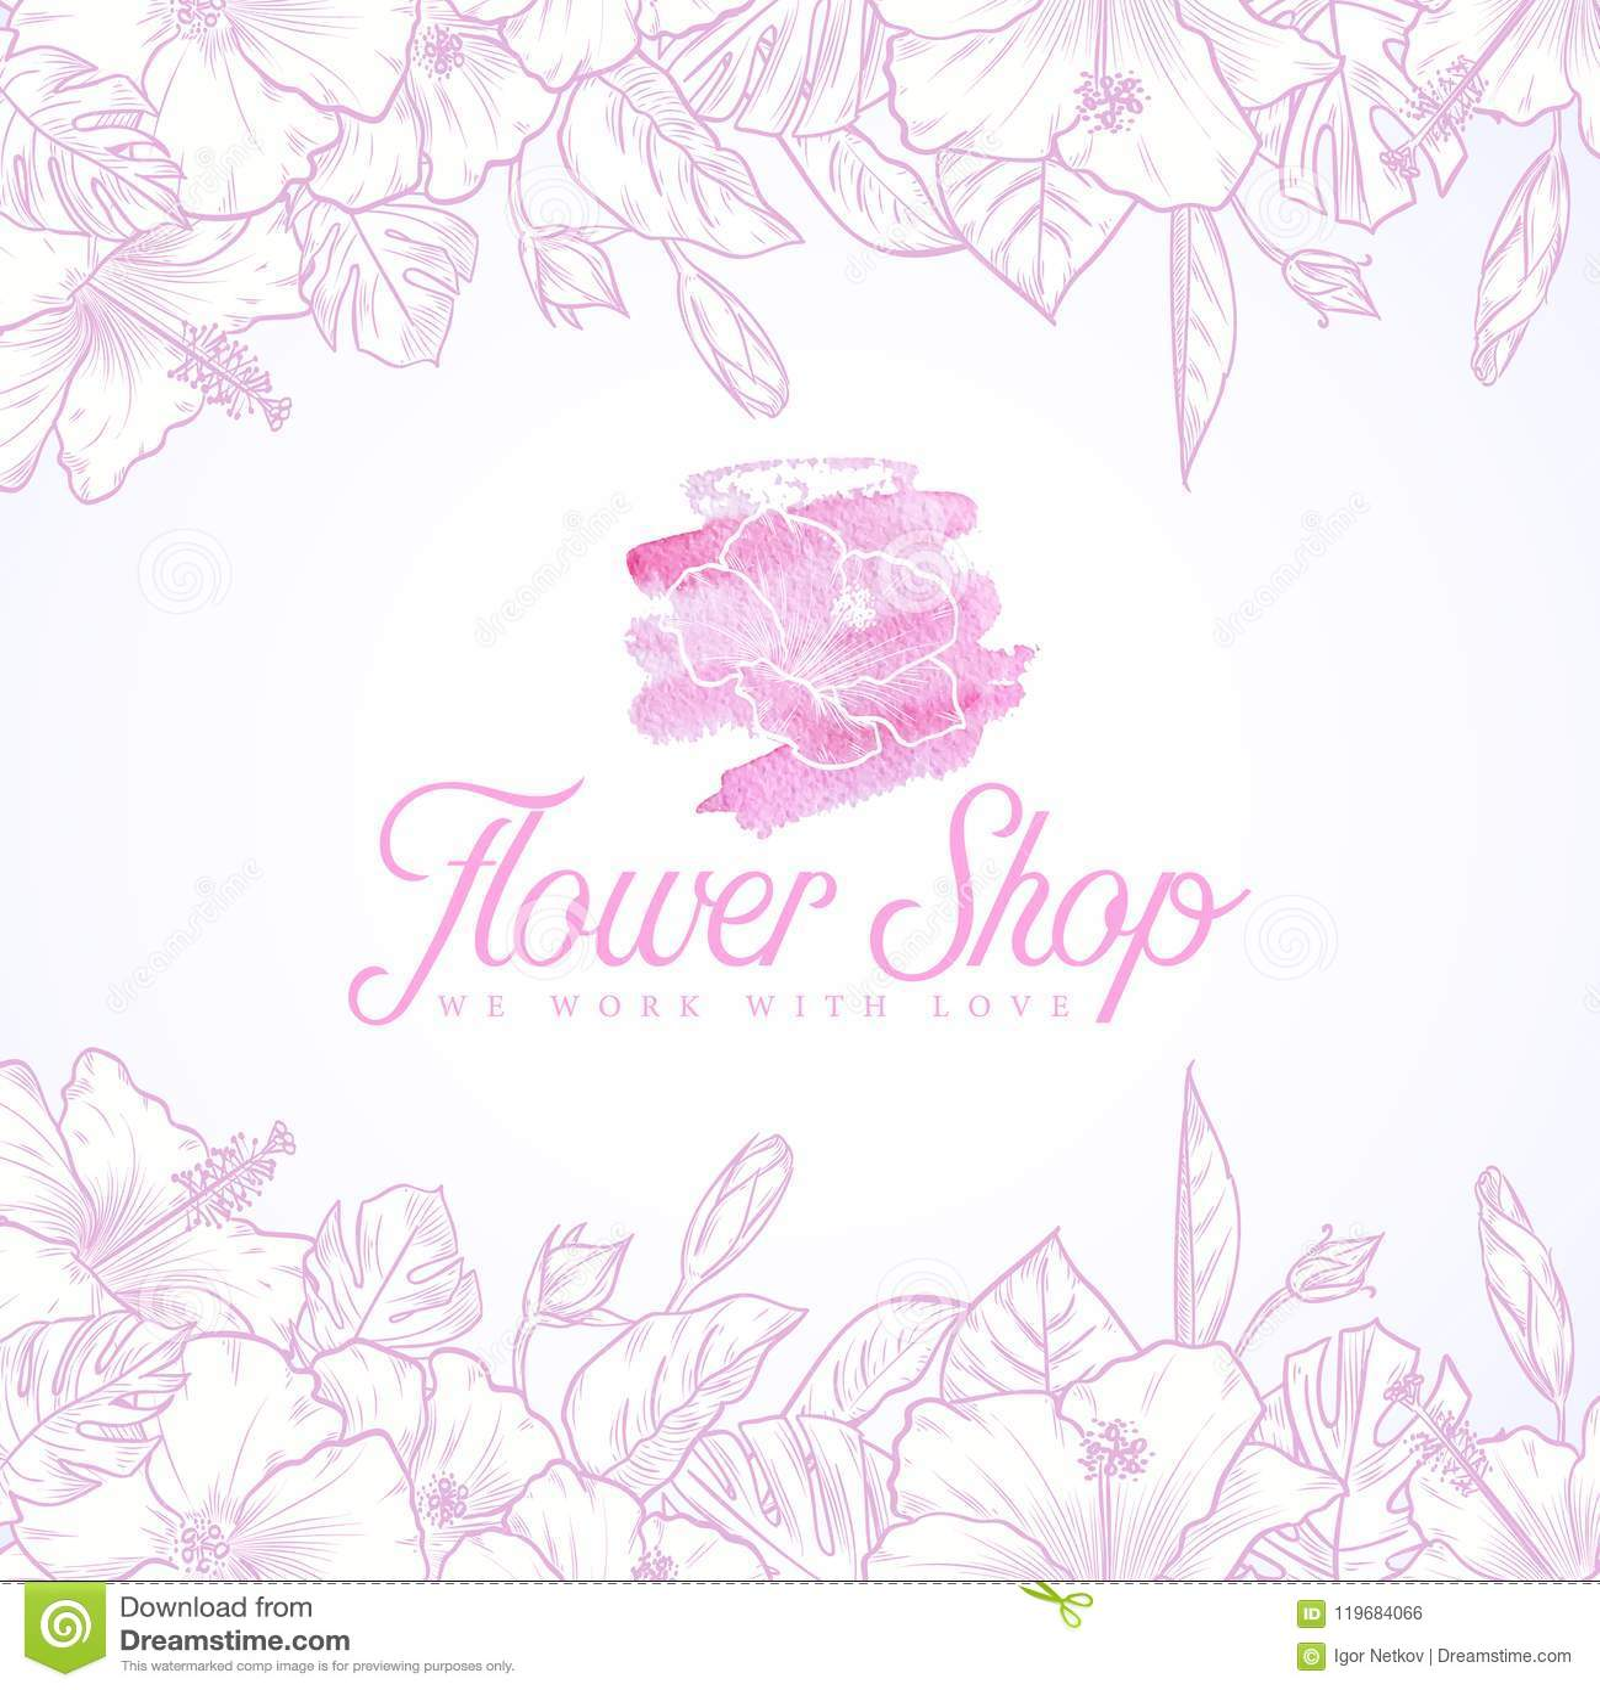 Flower Shop Logo Stock Vector Illustration Of Green 119684066